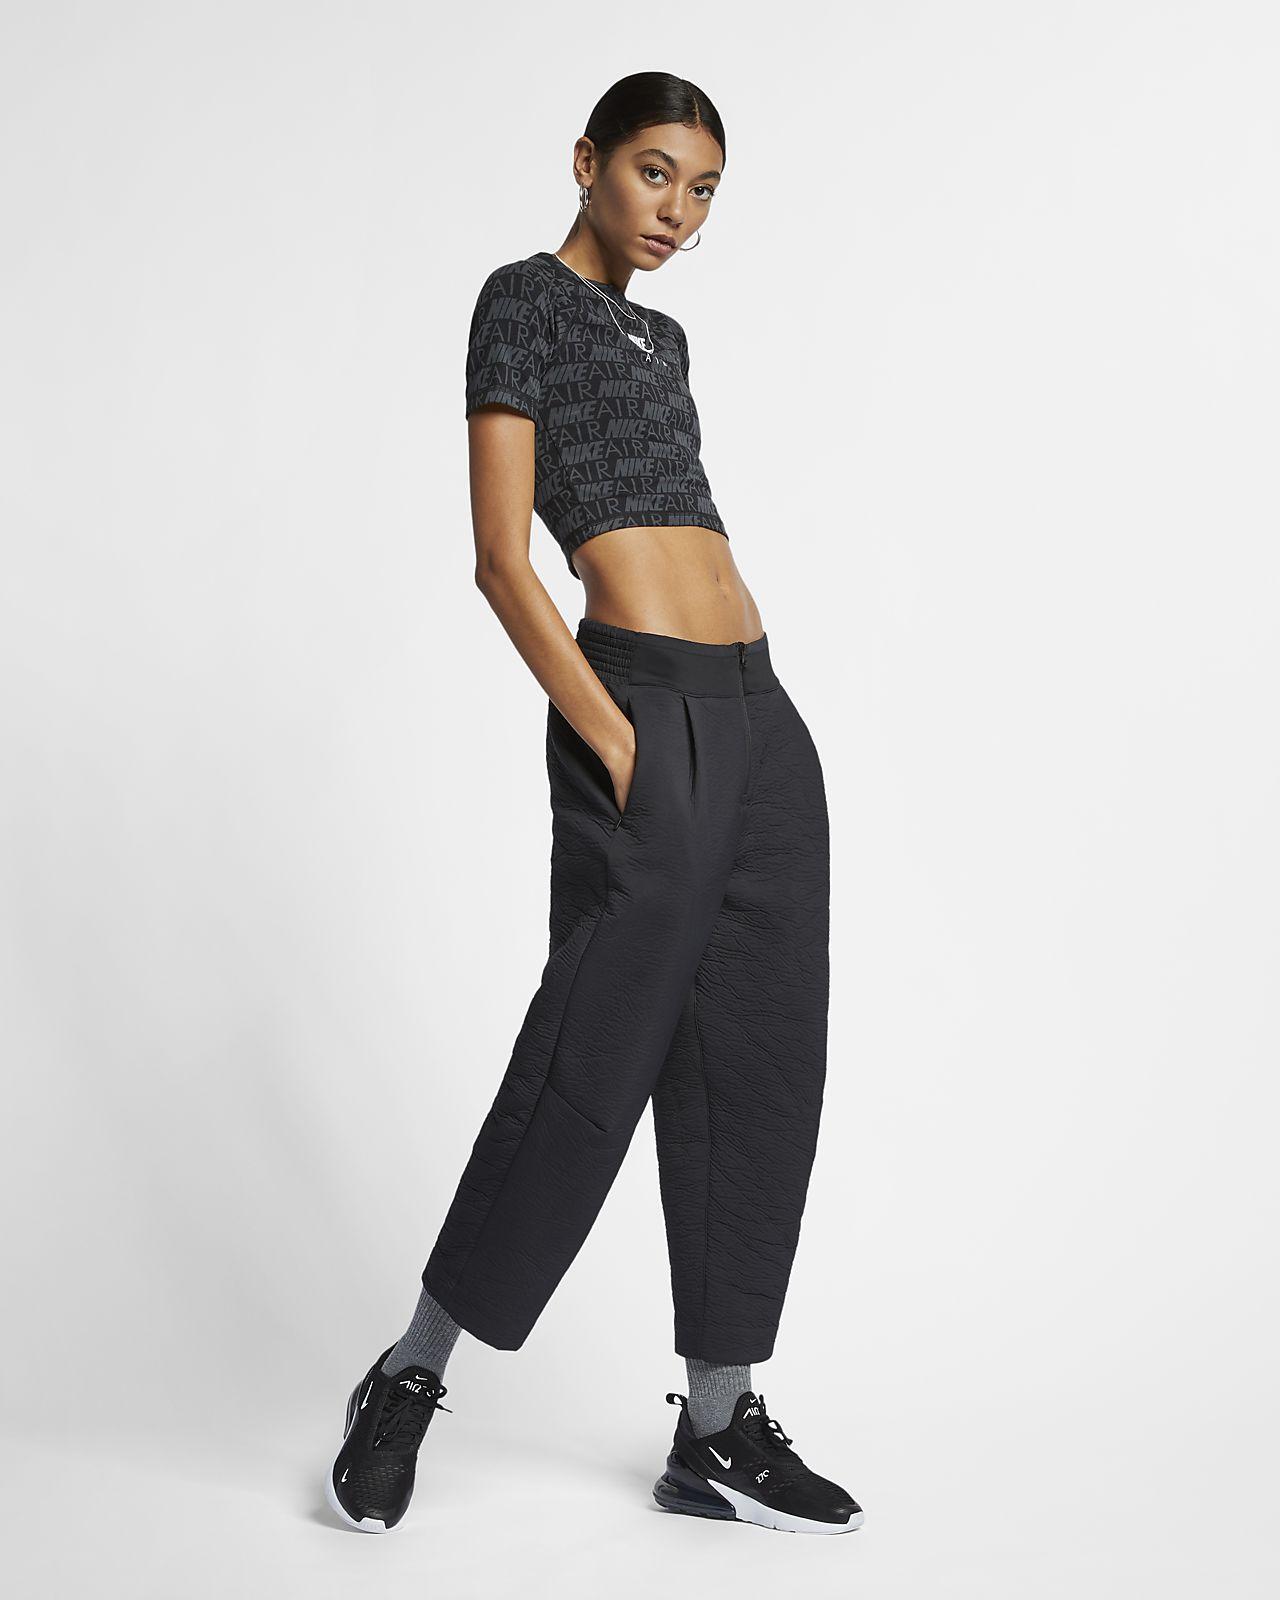 2885a38f60487b Nike Air Women s Short-Sleeve Print Top. Nike.com AU